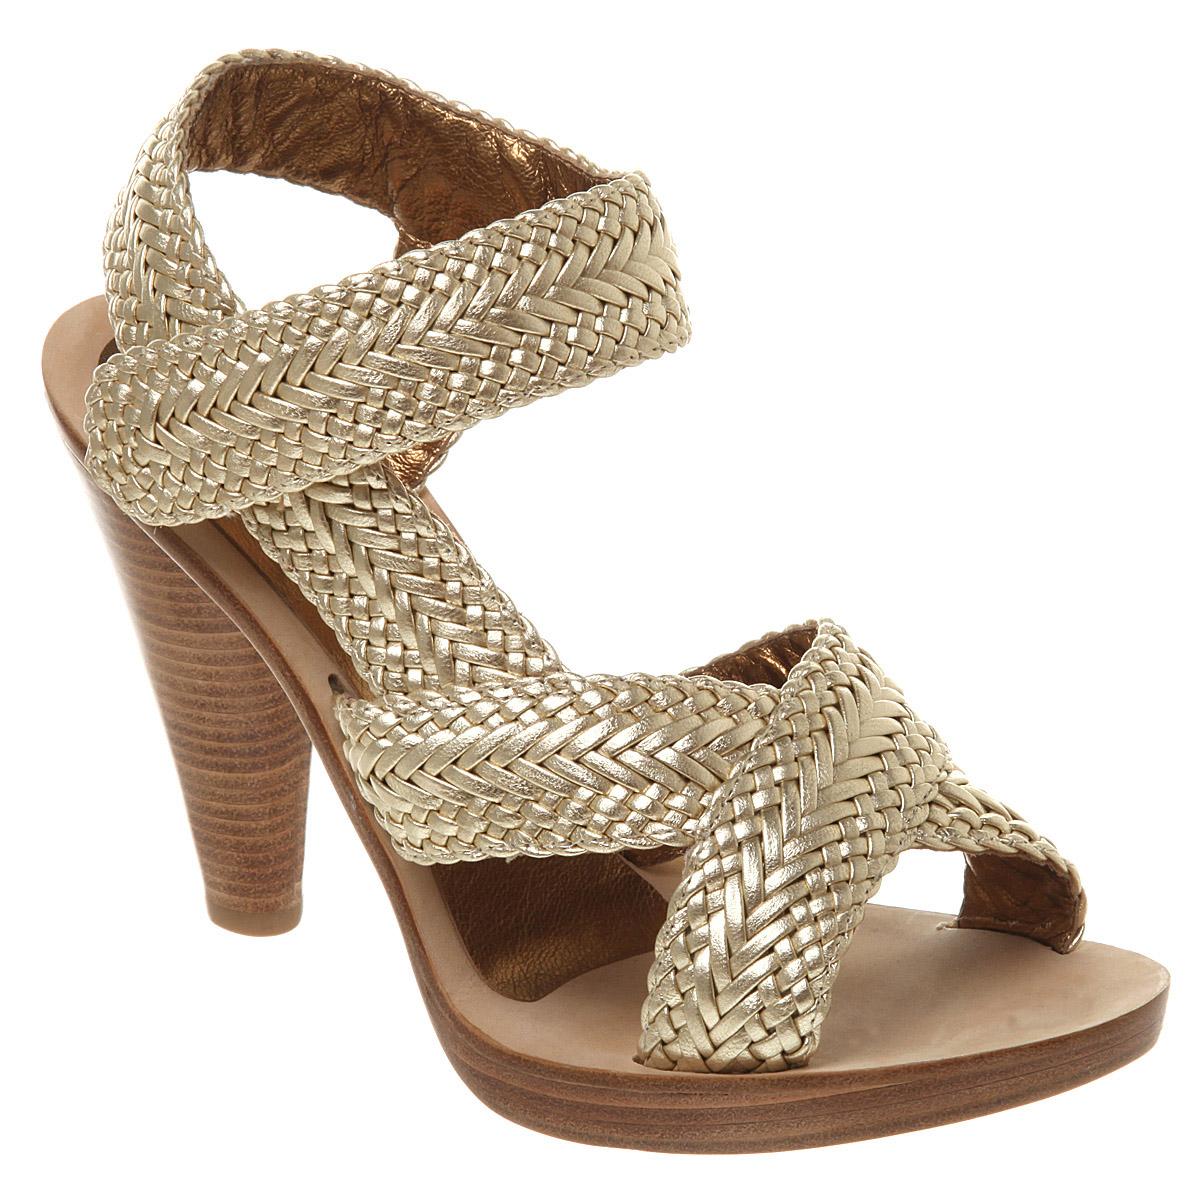 Womens-Cynthia-Vincent-Brady-Platform-Sandal-Gold-Leath